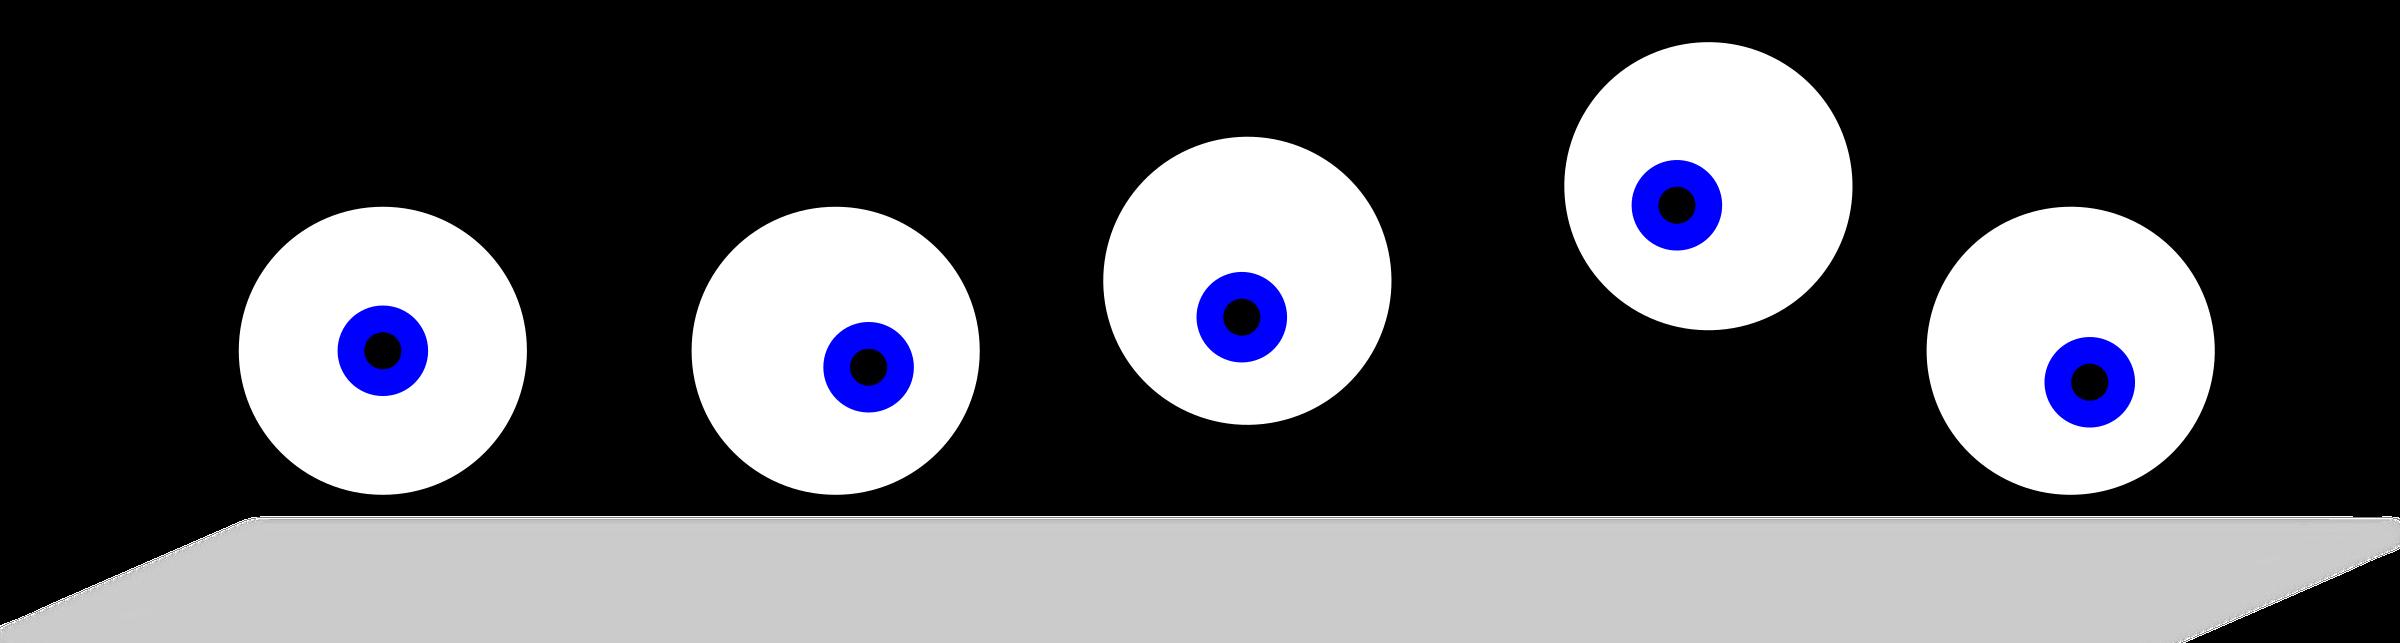 Eyeball clipart rolling eyes Eyes Clipart rolling rolling algotruneman